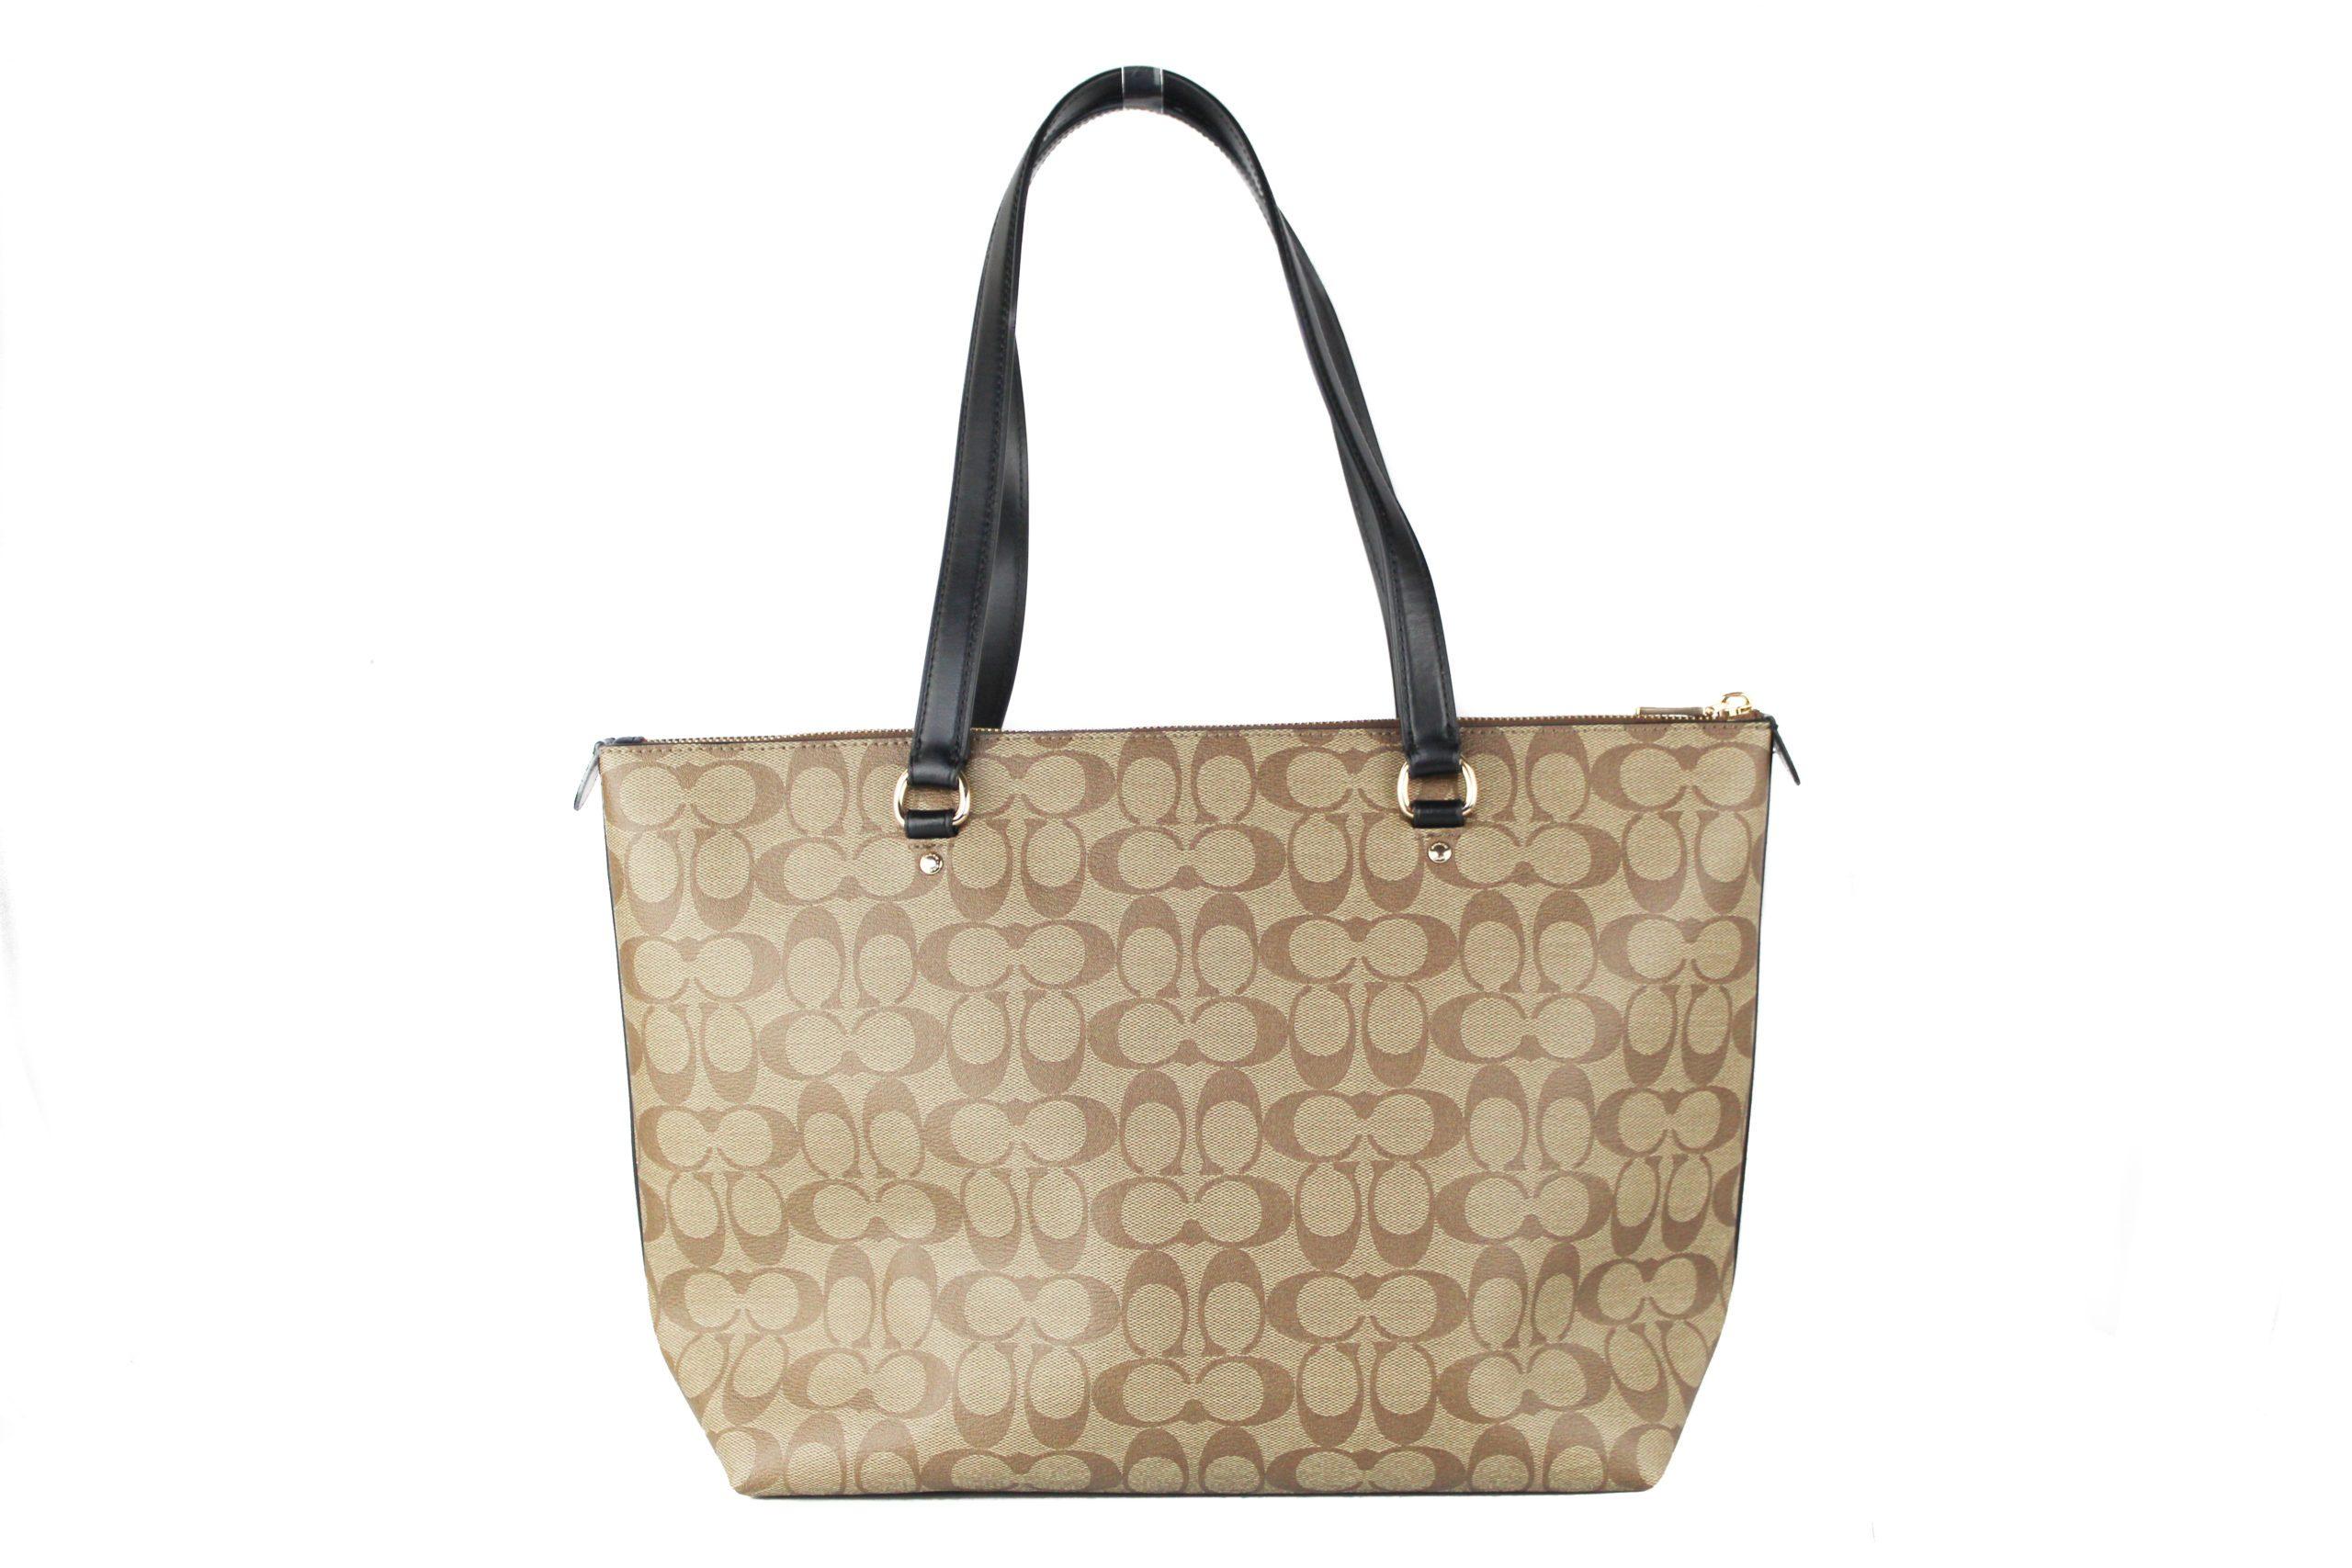 COACH Women's Canvas Leather Tote Bag Khaki 504292